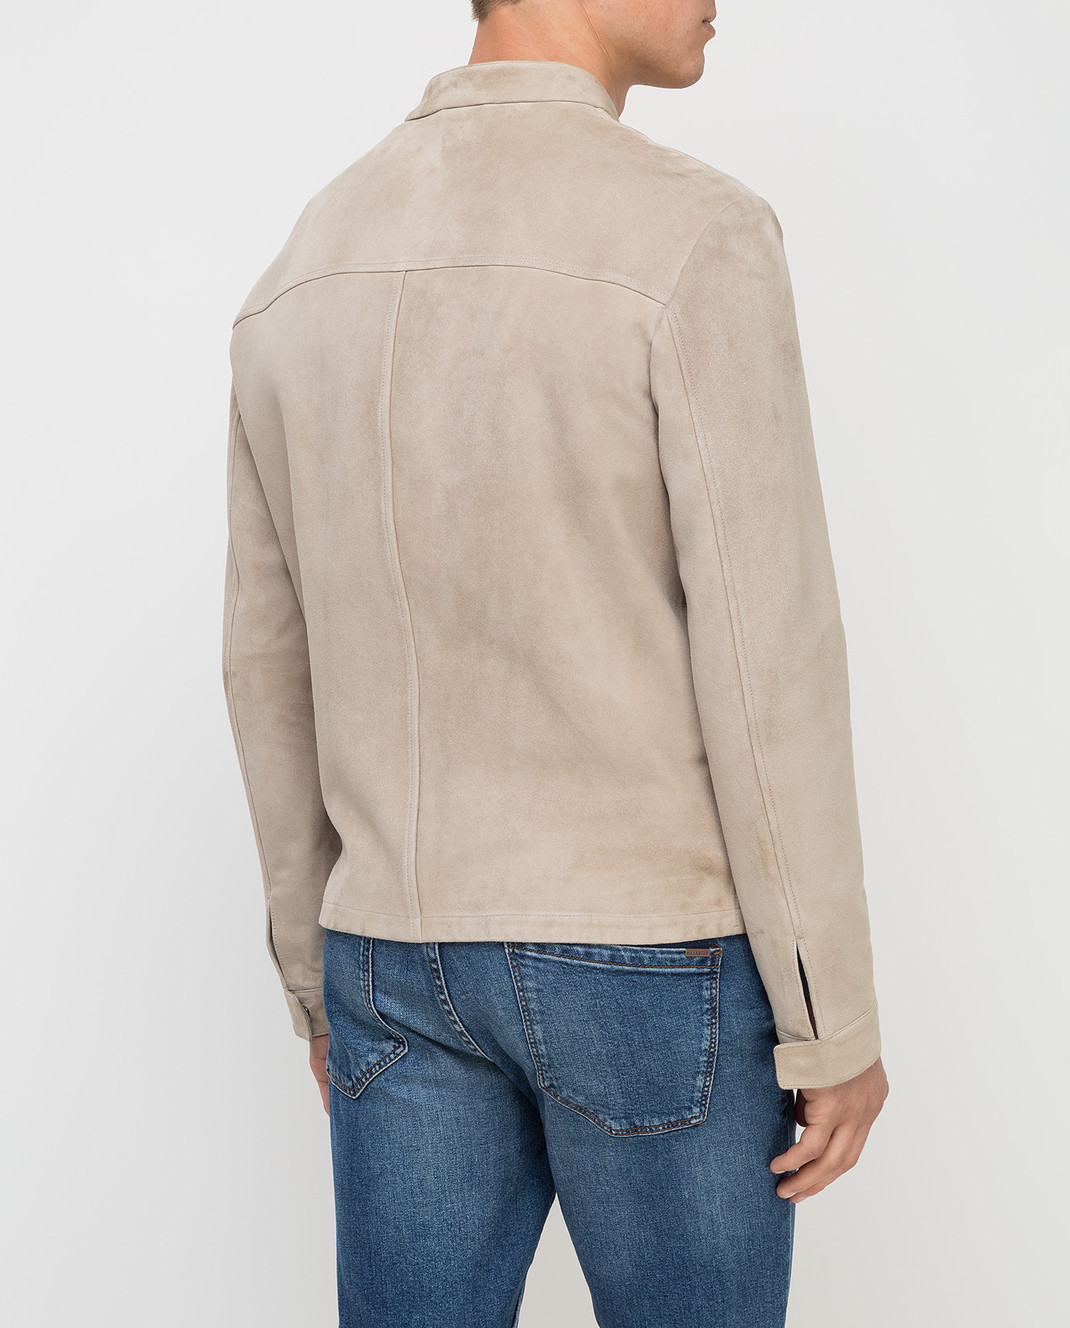 Loro Piana Светло-бежевая замшевая куртка F1FAG1790 изображение 4